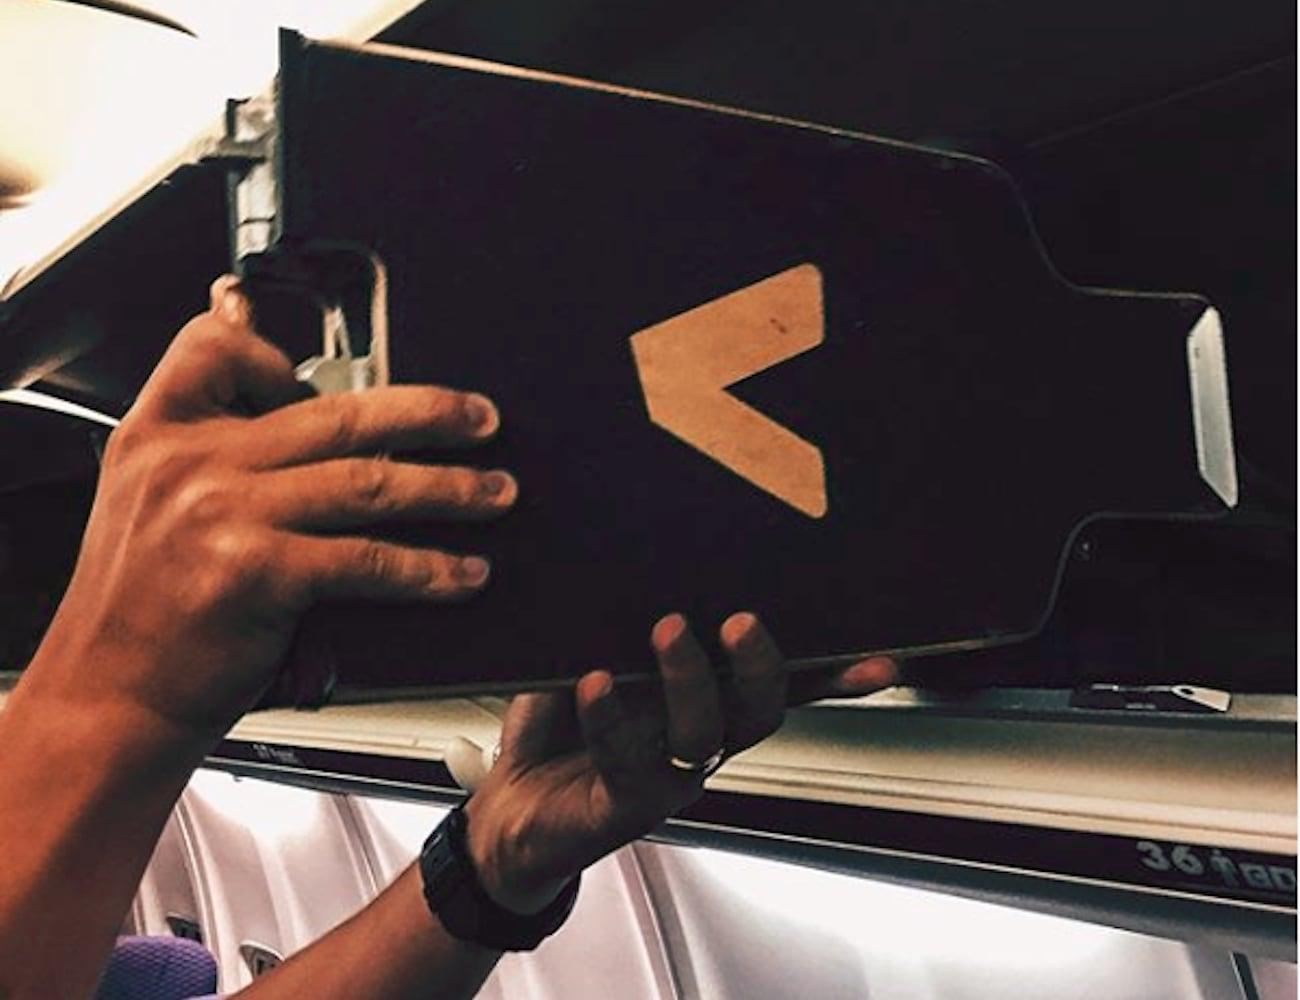 BoardUp V3.2 Foldable Travel Longboard